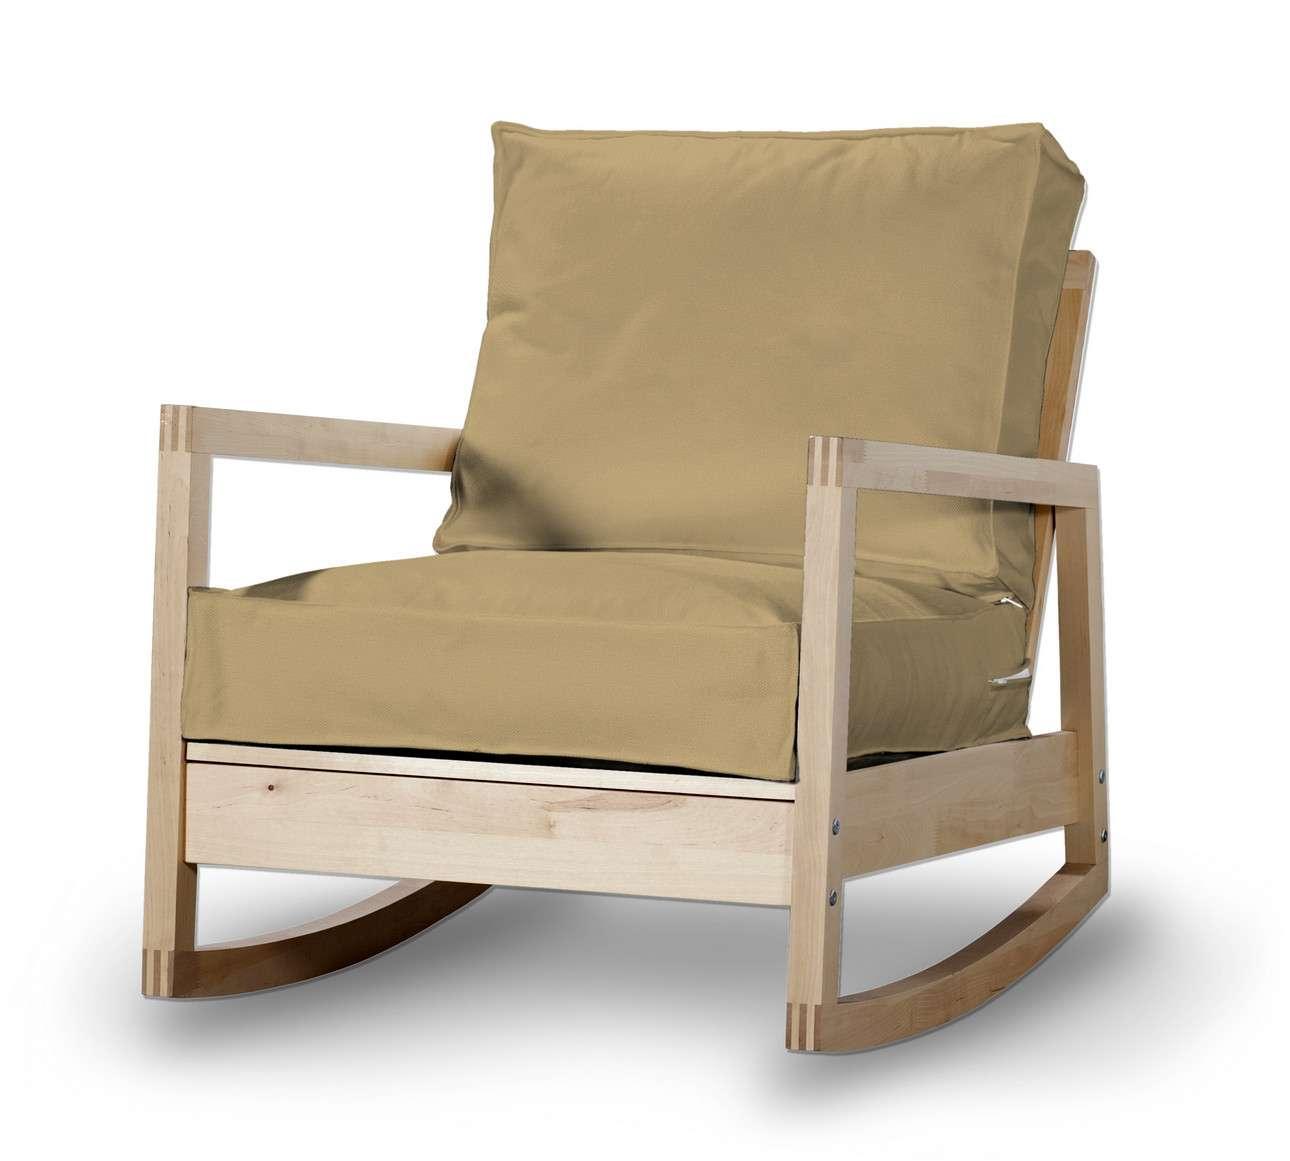 Pokrowiec na fotel Lillberg w kolekcji Living, tkanina: 160-93